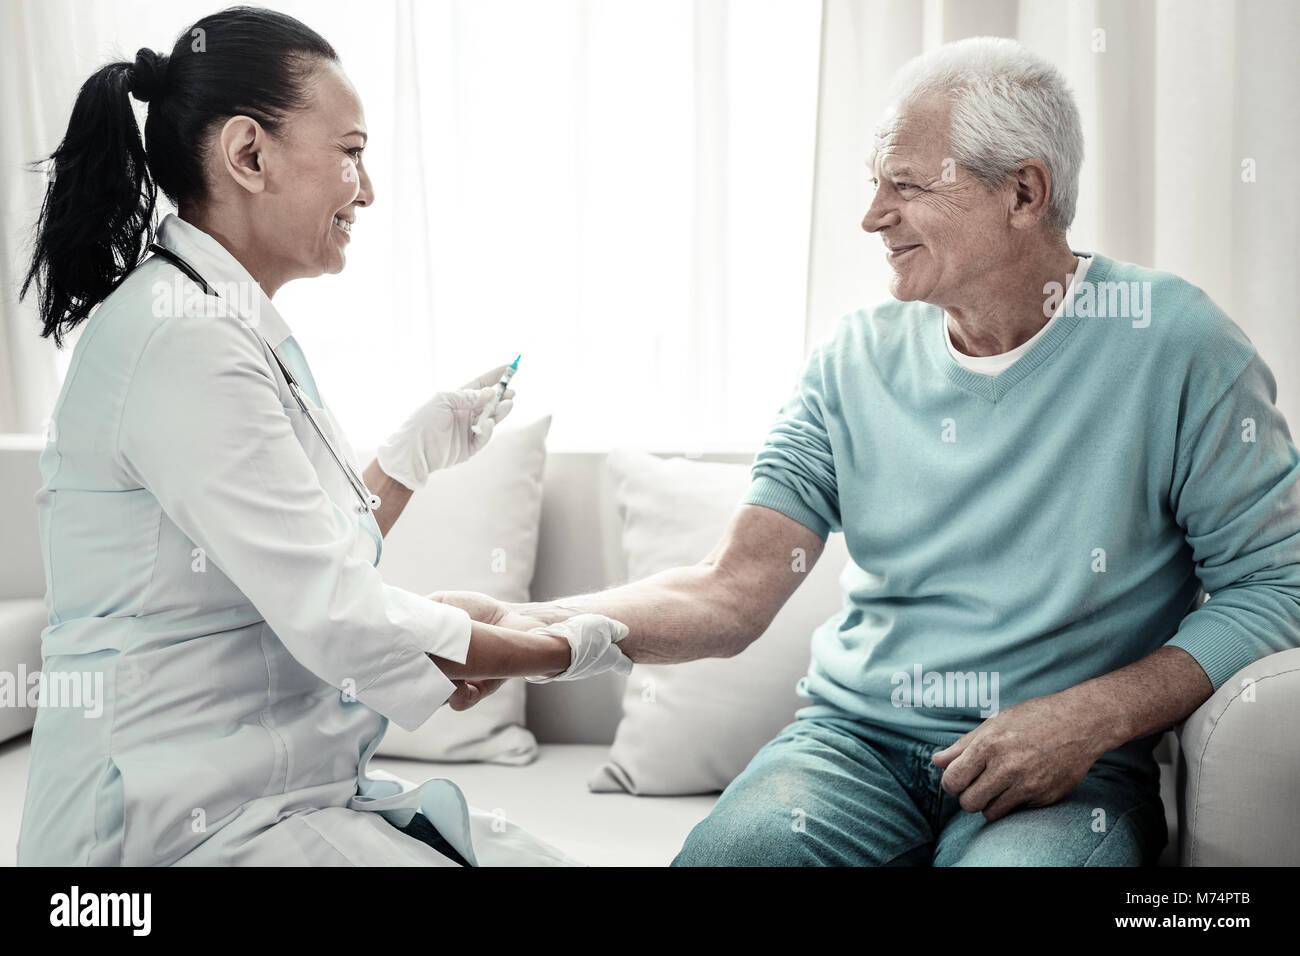 Joyful cute nurse smiling and making injection. - Stock Image